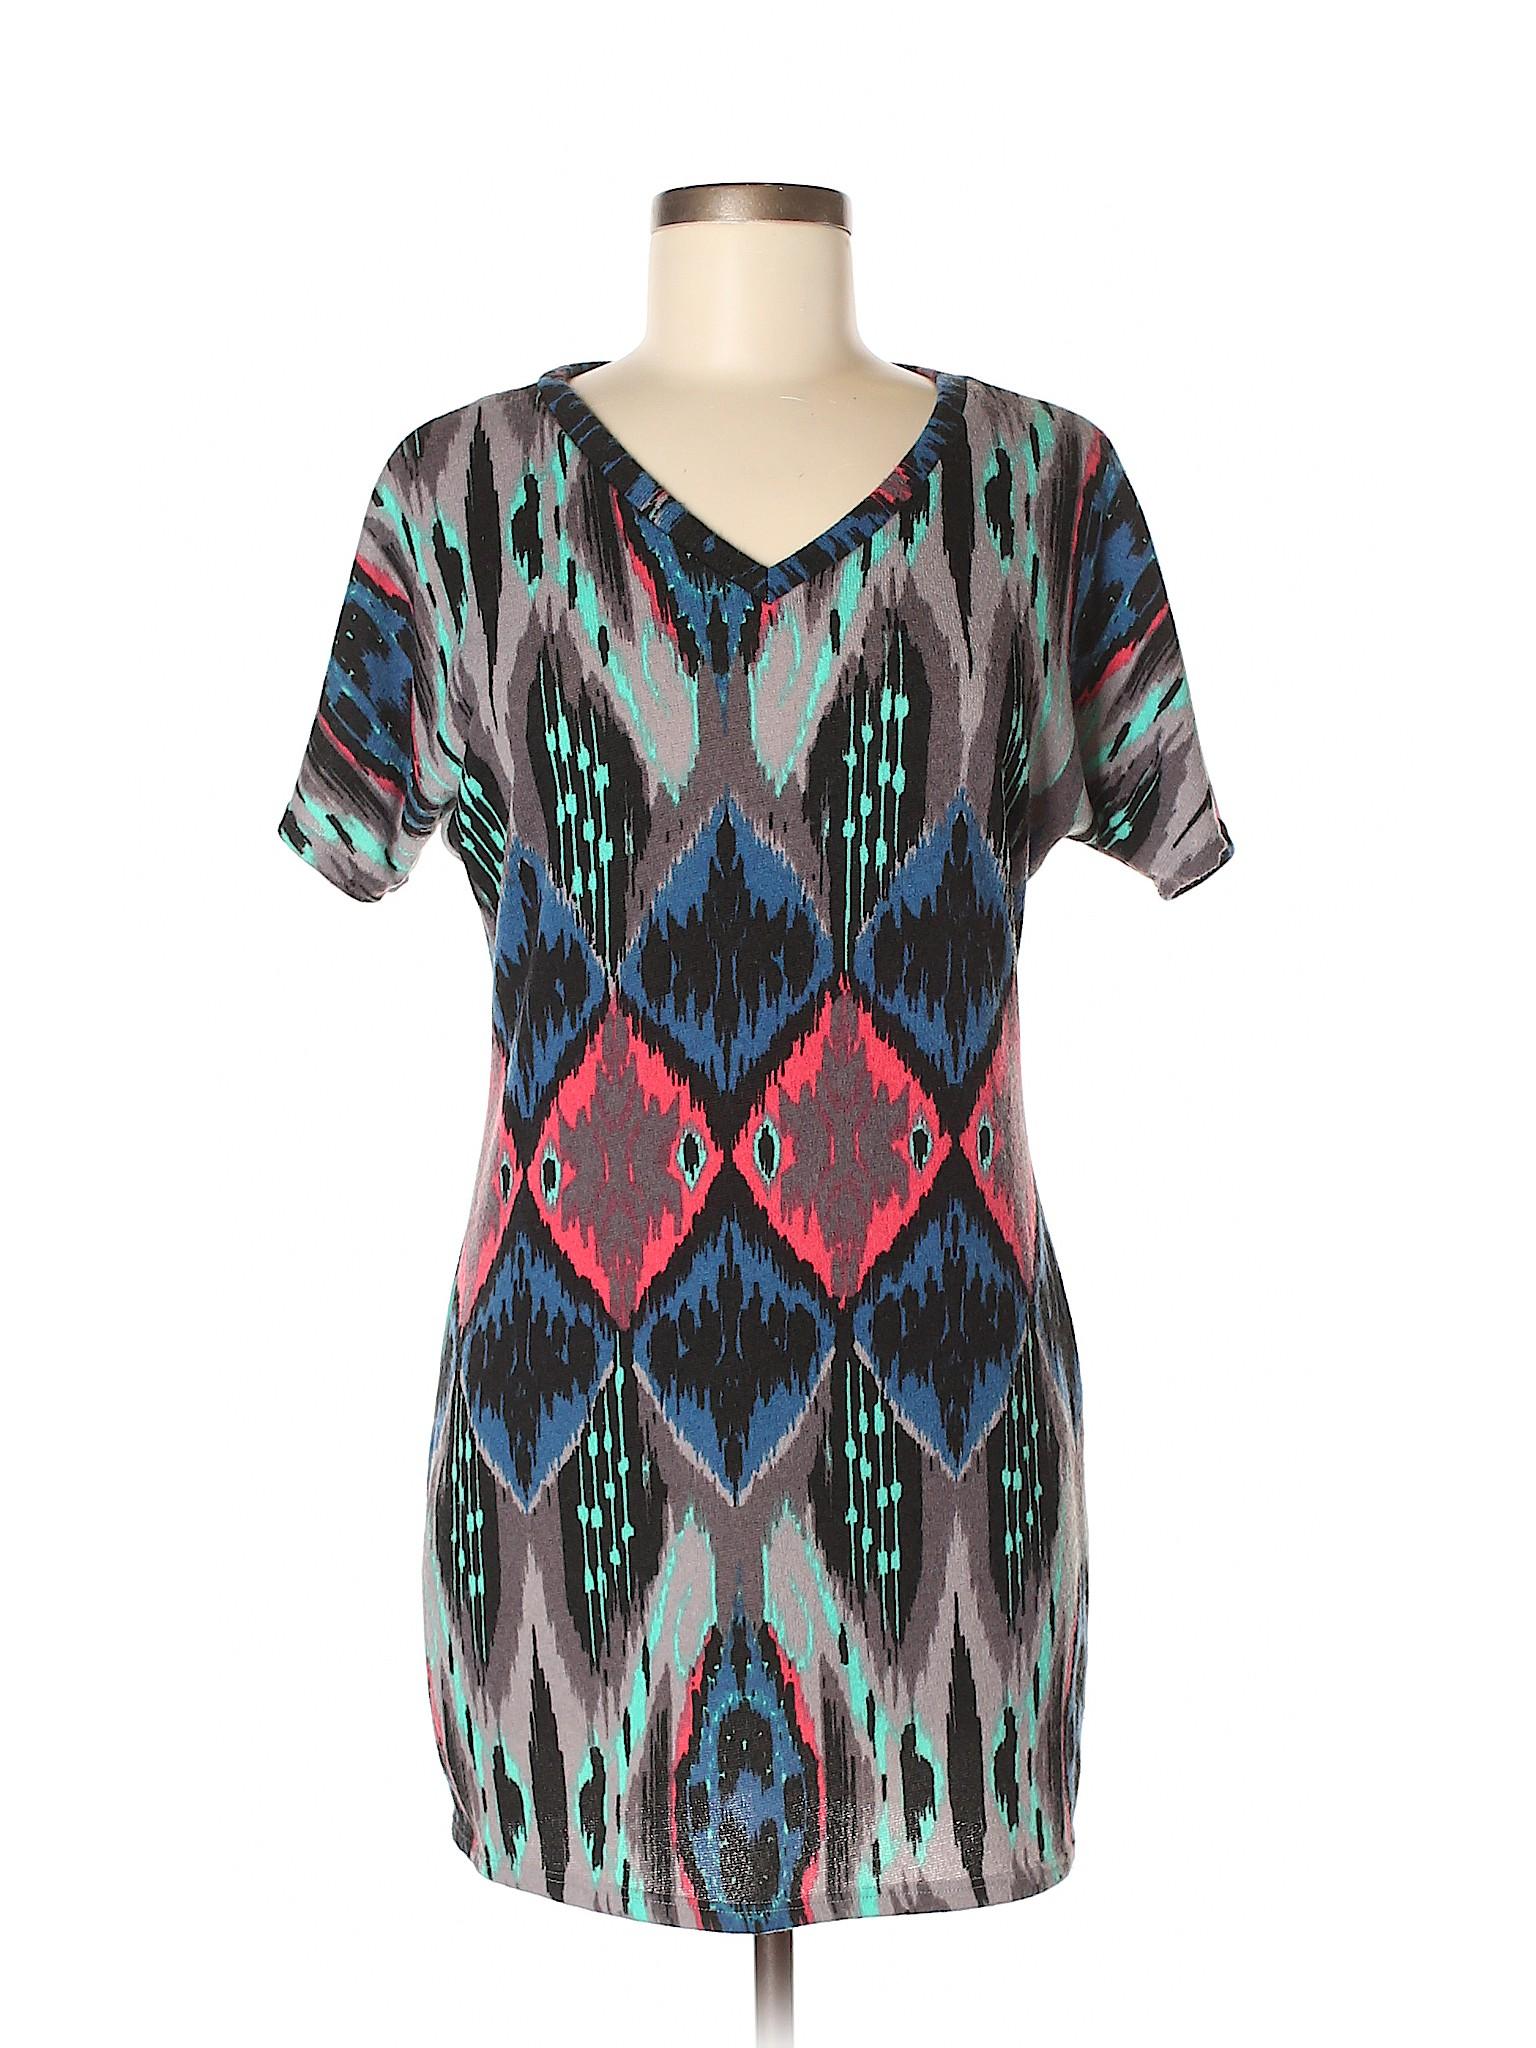 Casual Myan Selling Dress Casual Selling Myan Selling Casual Dress Myan qHZwtqxf5n